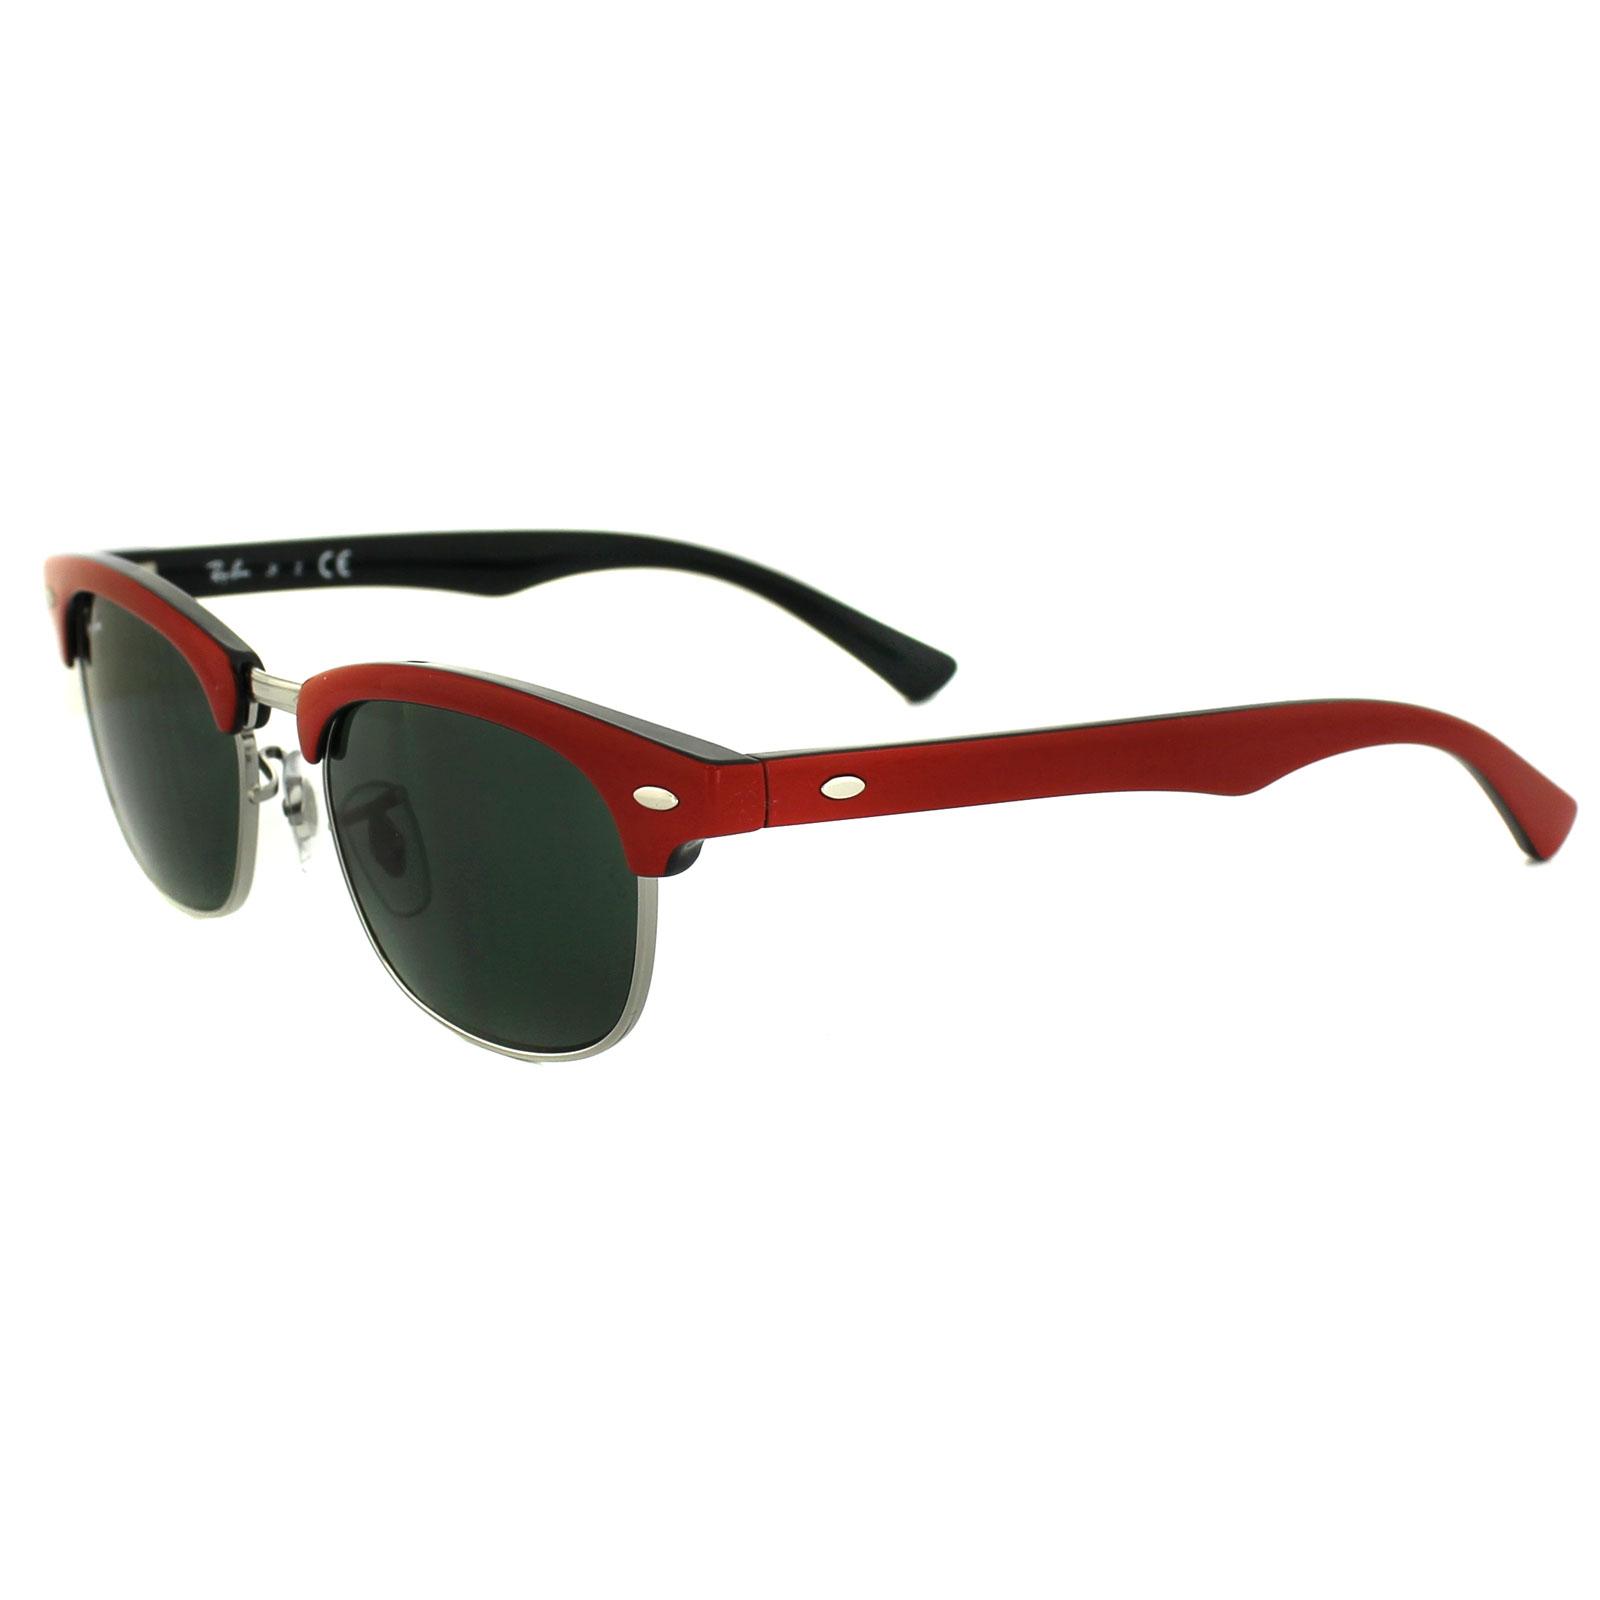 8bb78047fc Black Green  Cheap Ray-Ban Junior Sunglasses 9050 162 71 Red   Black ...